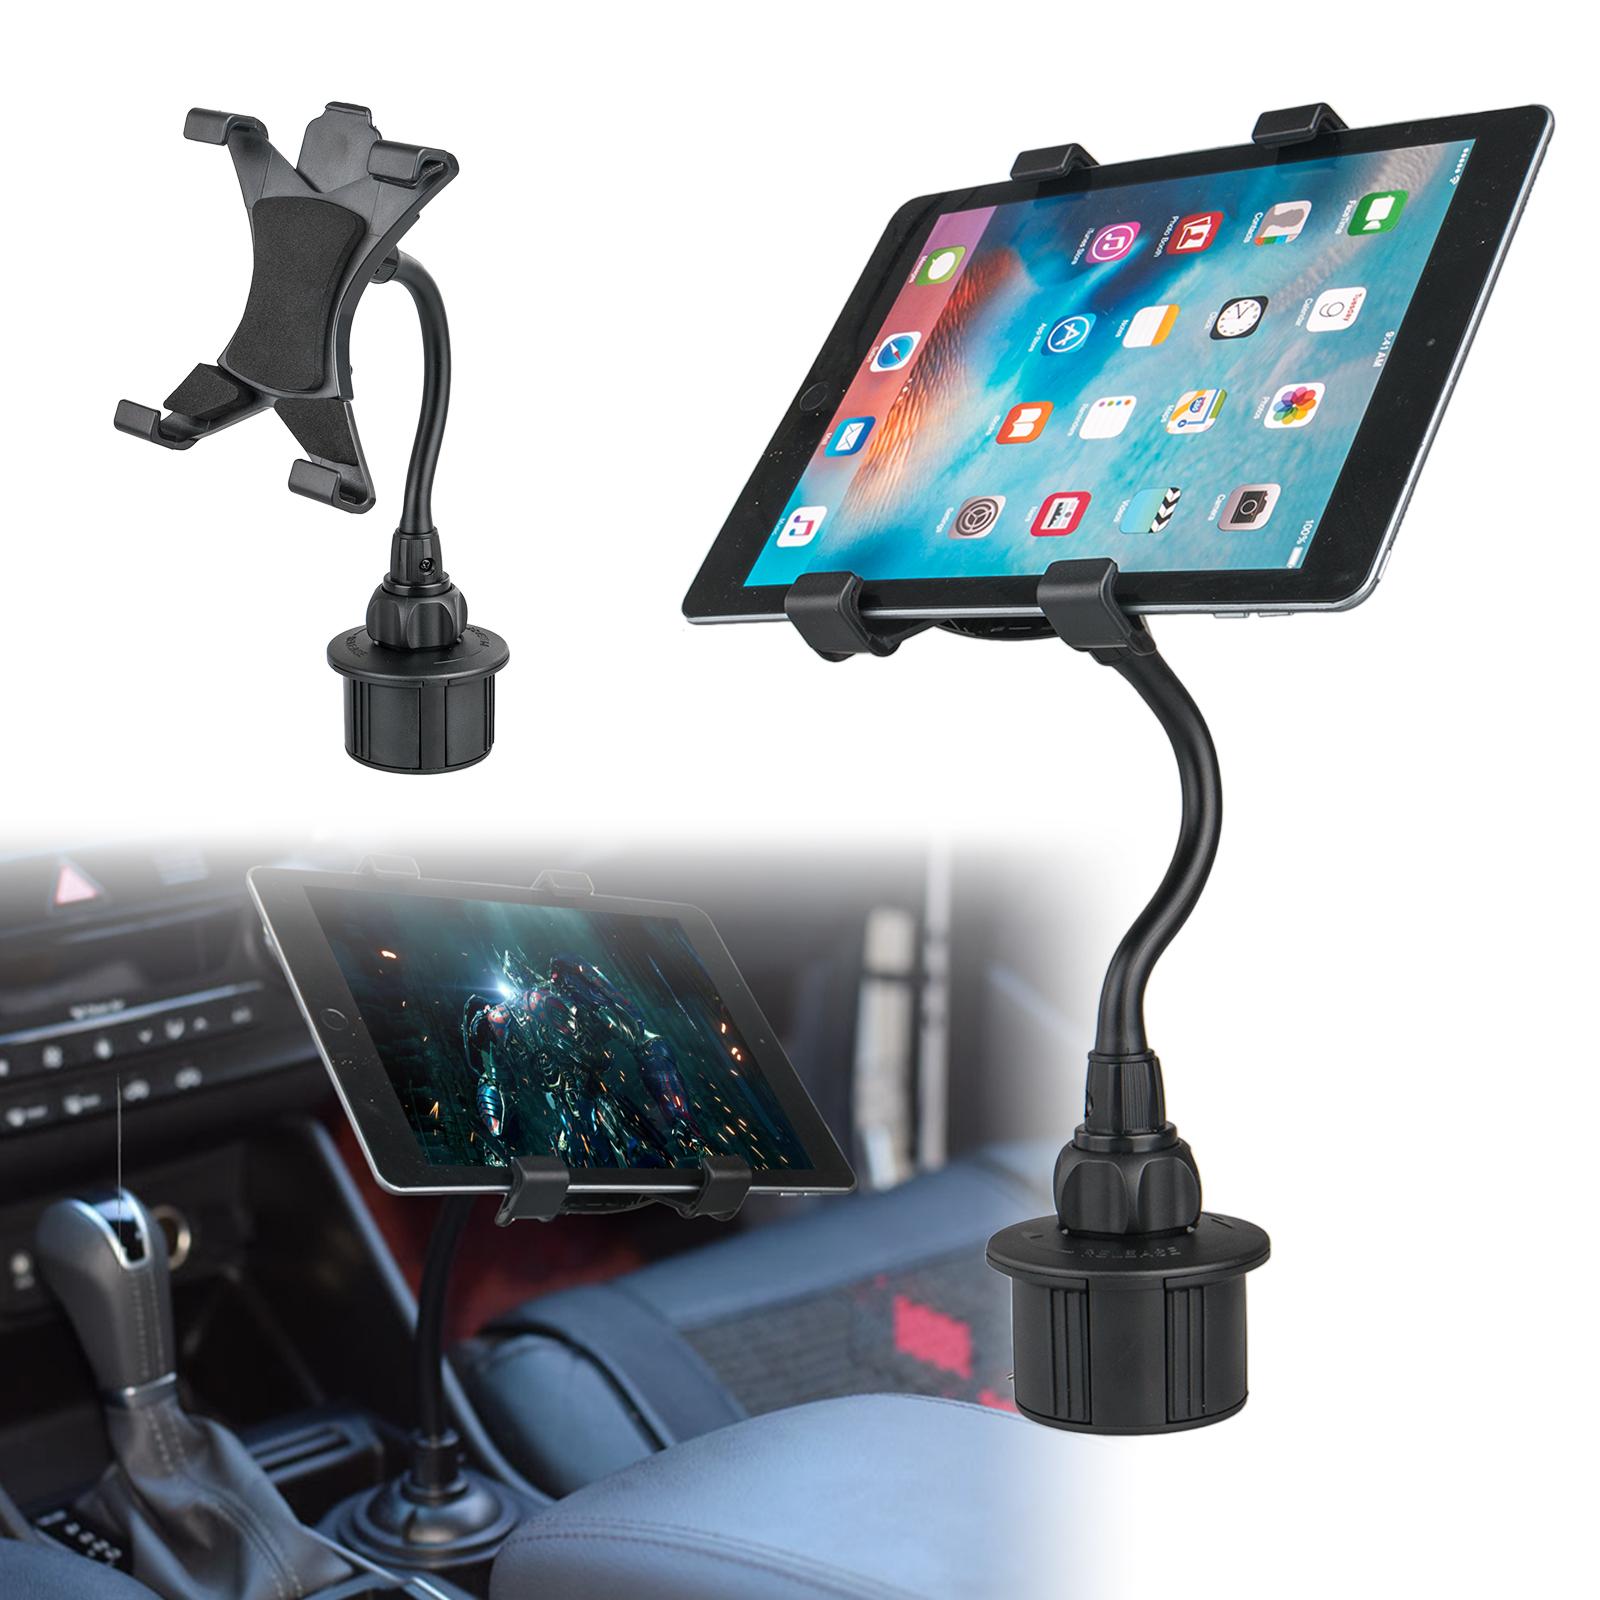 Adjustable Car Cup Holder Mount for Apple iPad Mini Samsung